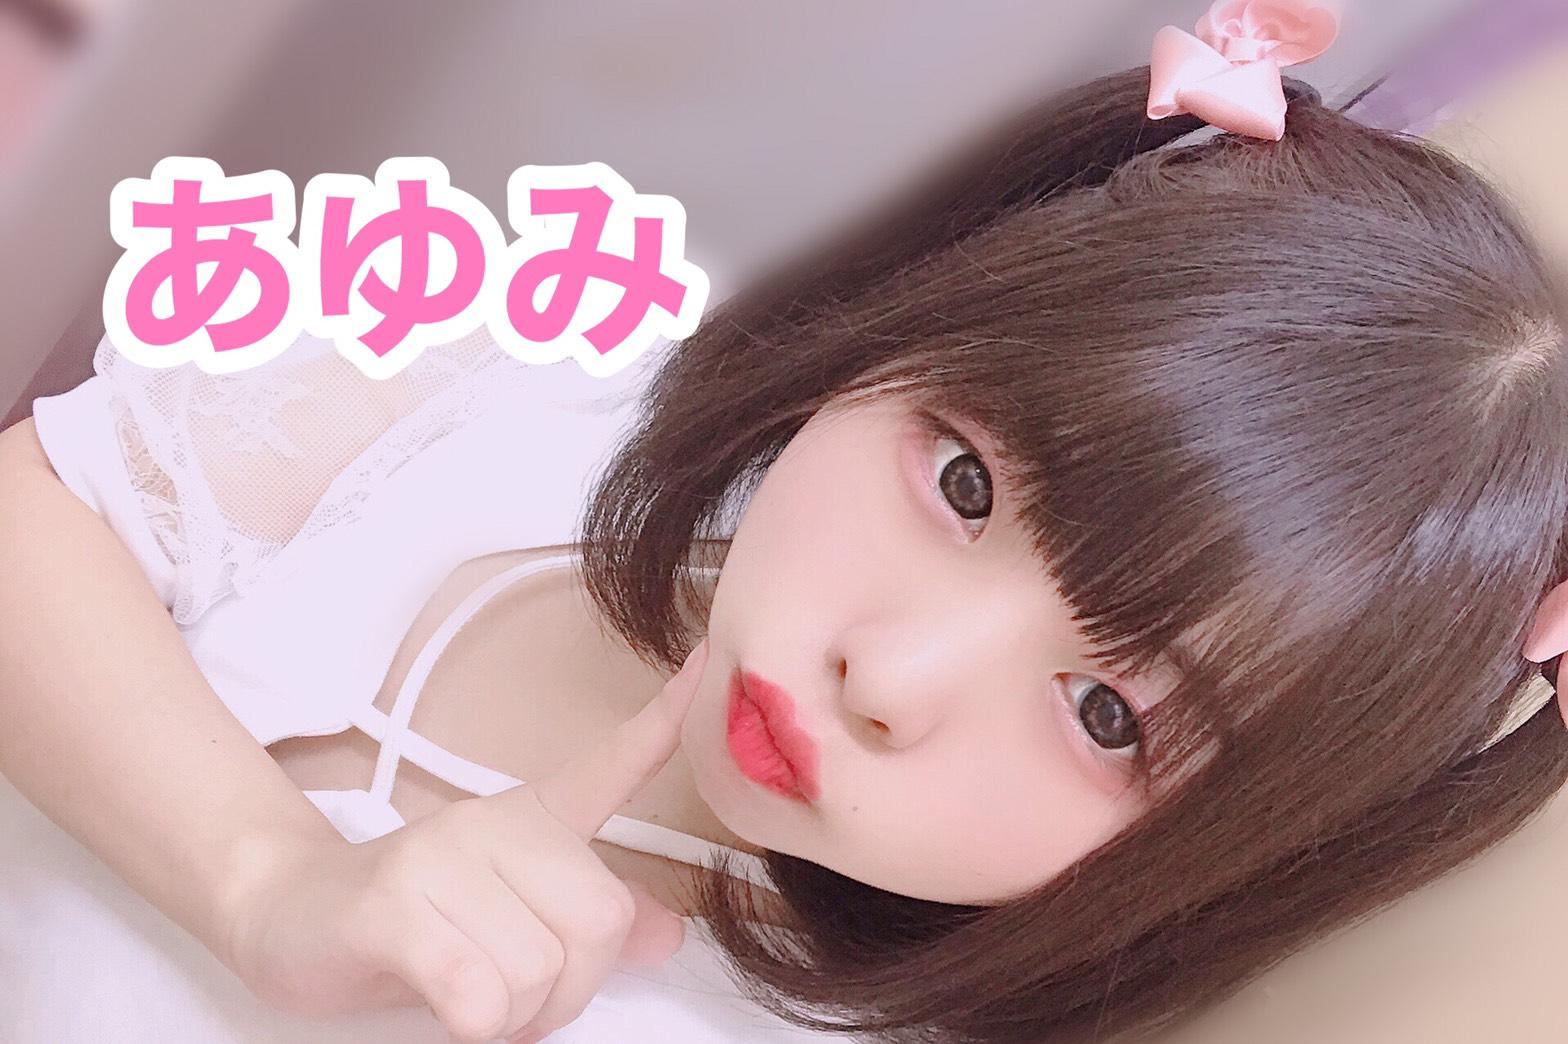 【MONSTER & VASH】IDOL PARADISE Vol.436 withアイドル対談《イキアタリバッタリ》